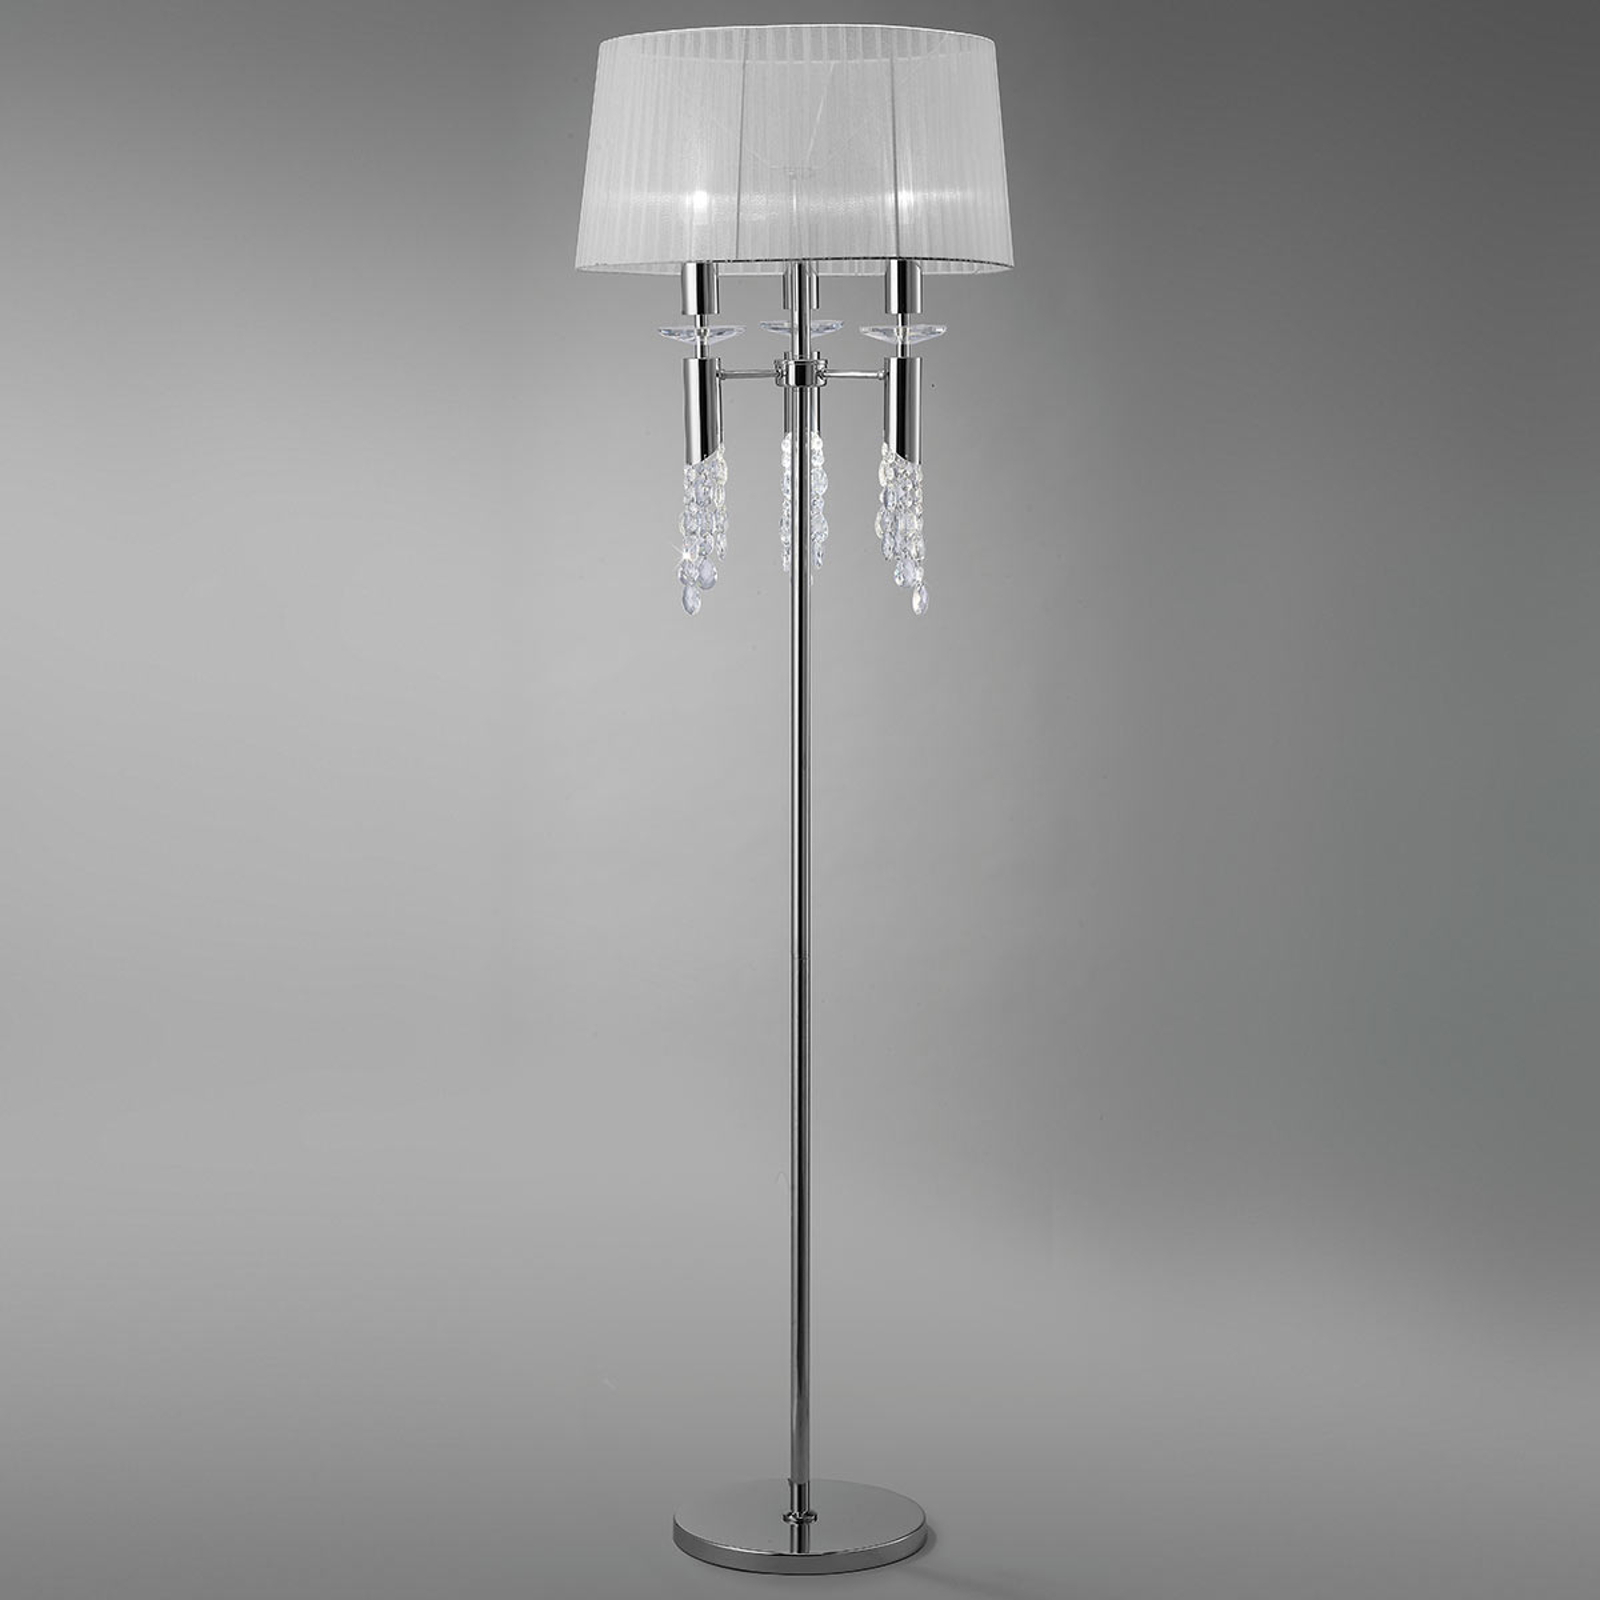 Beau lampadaire Lilja